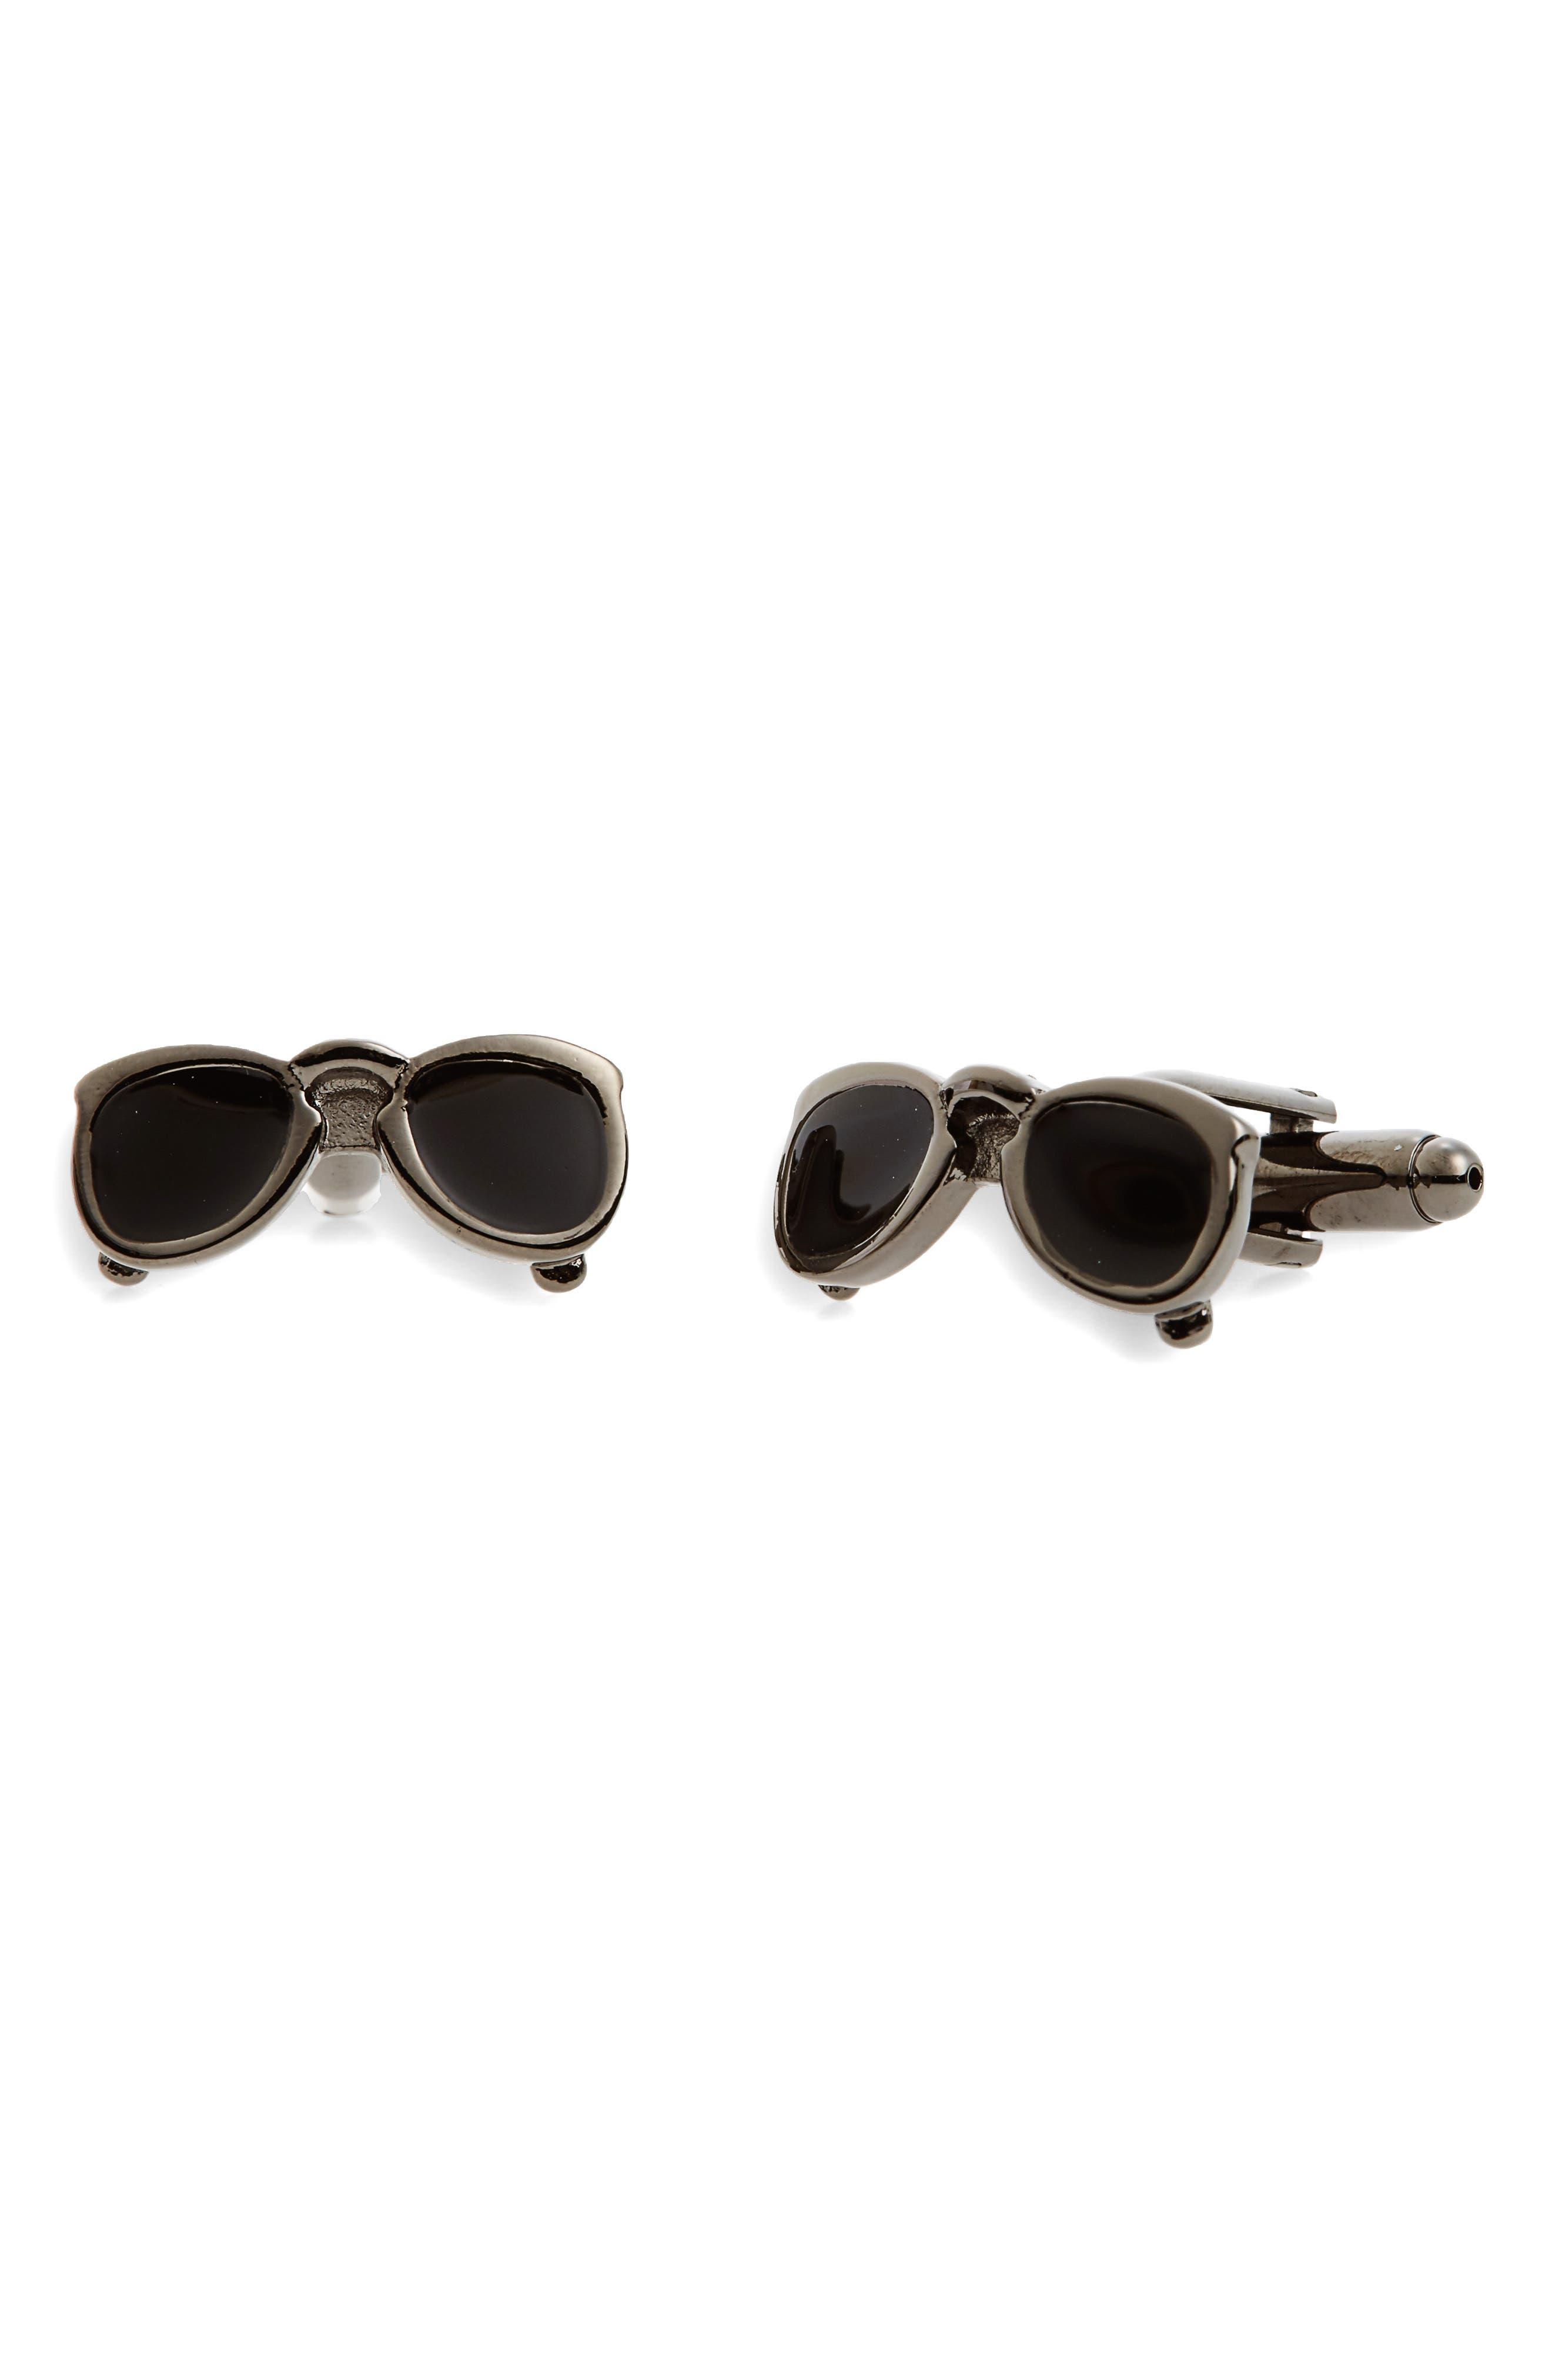 Sunglasses Cuff Links,                         Main,                         color, 001